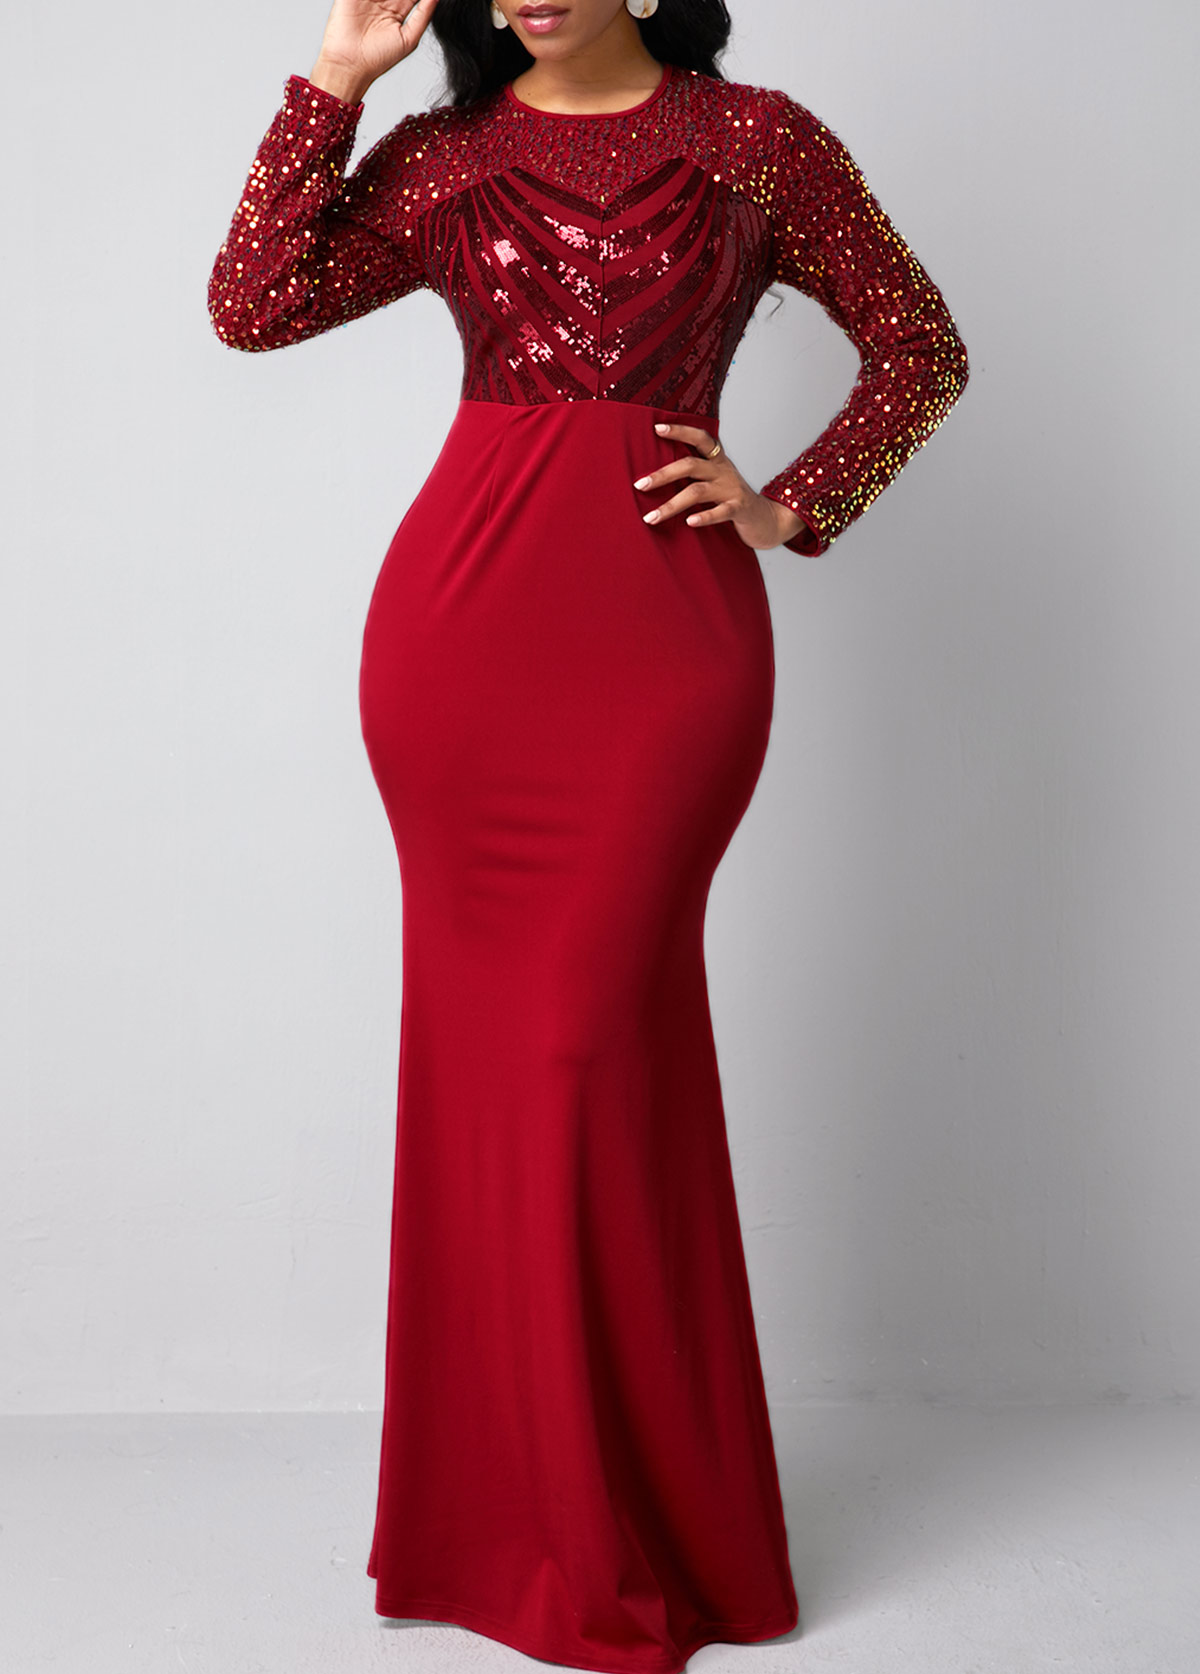 ROTITA Long Sleeve Sequin Detail Red Mermaid Dress